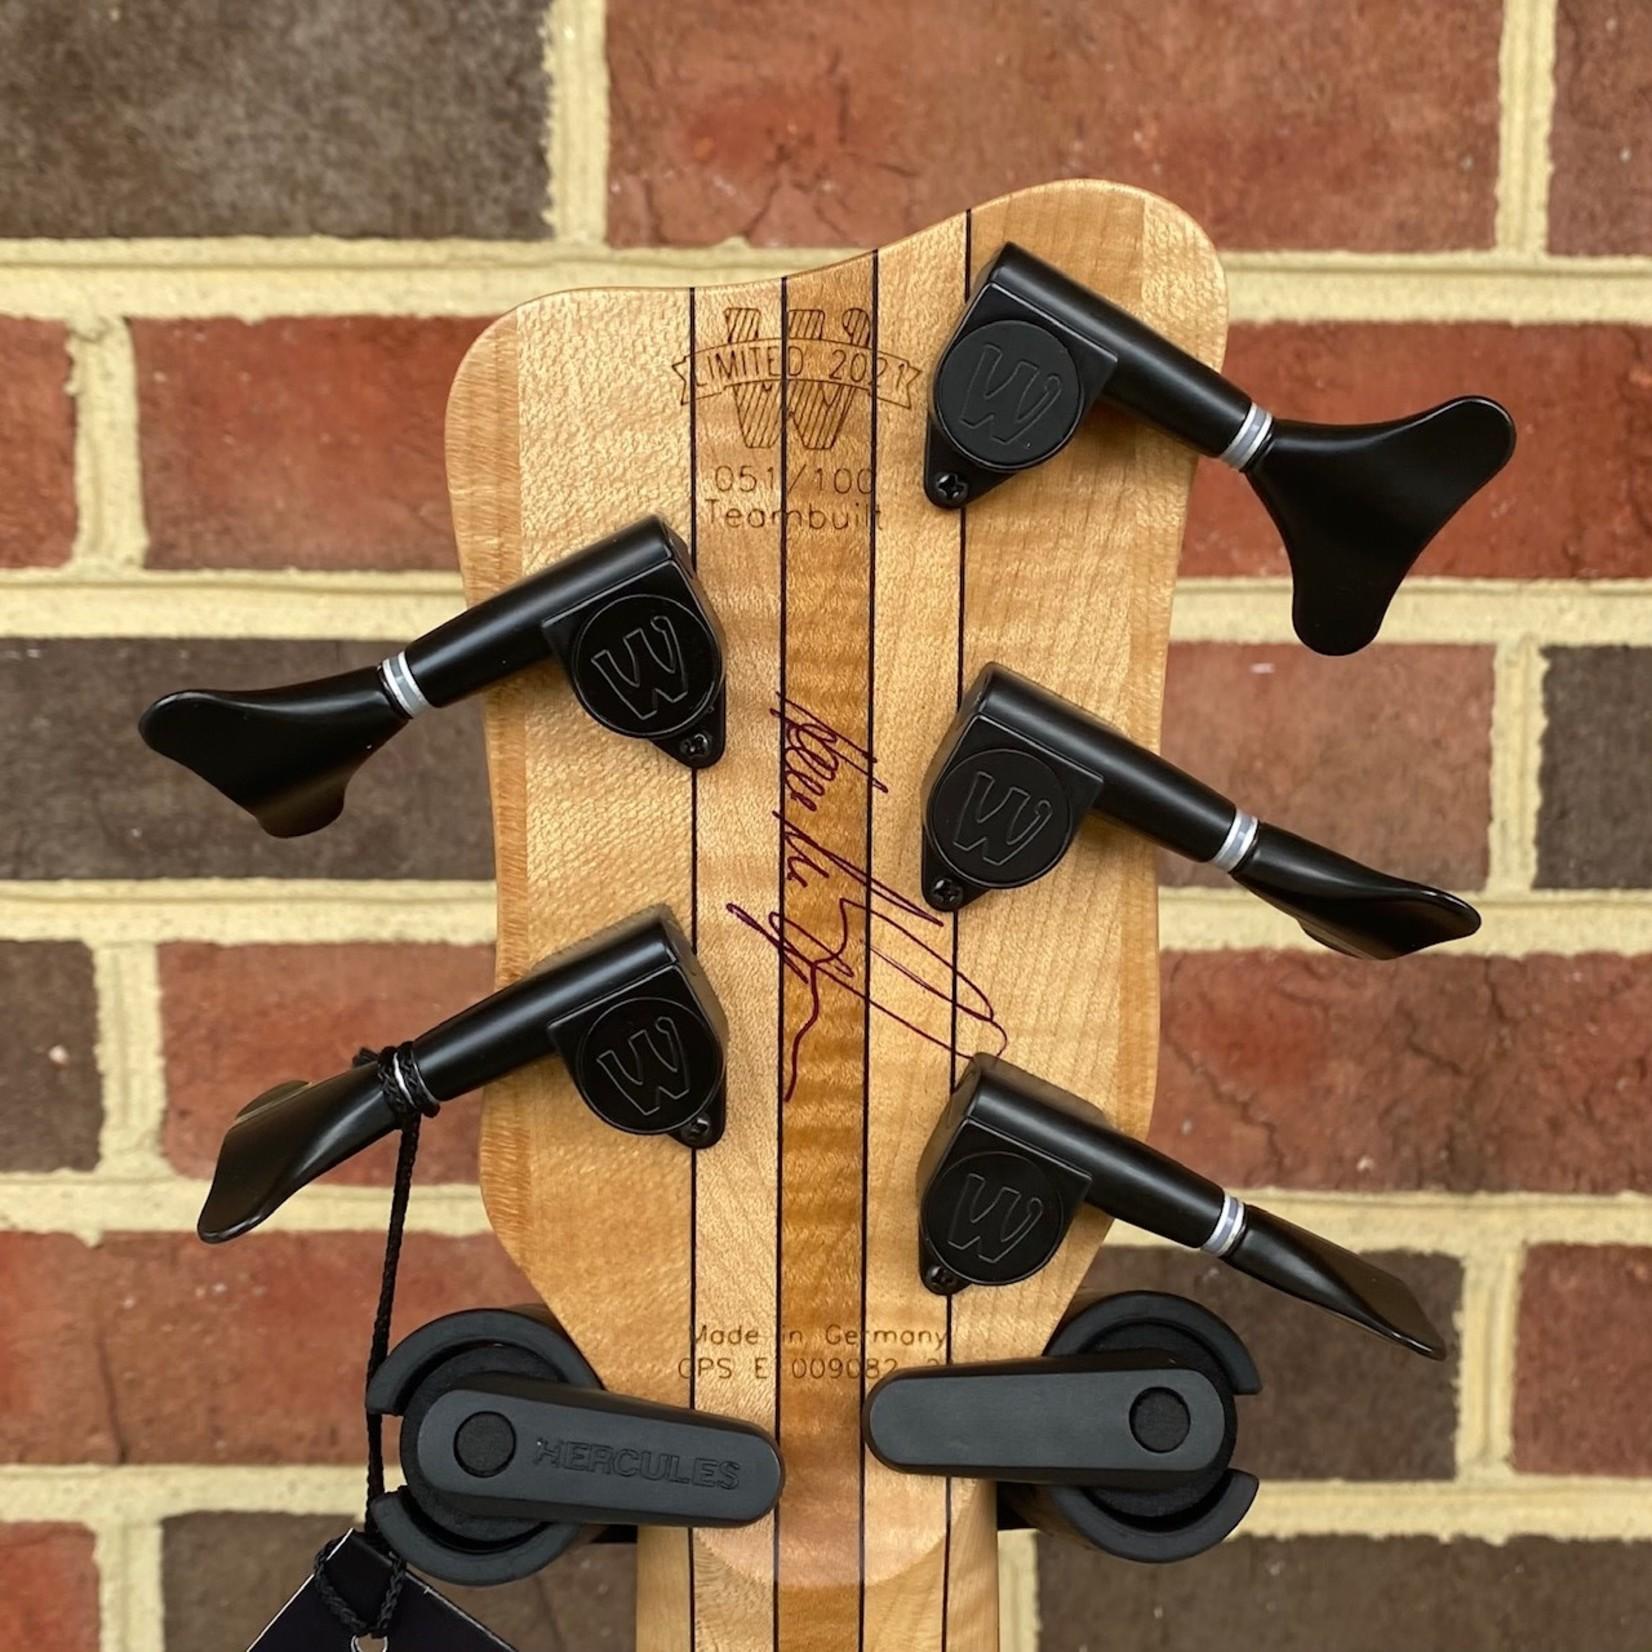 Warwick Warwick Pro Series 2021 LTD Streamer LX Bolt-On, #051 of 100 Worldwide, 5-String, Solid Black Korina Body, 9pc Maple/Ekanga Bolt-On Neck, Pau Ferro Fretboard, Matching Headstock, Passive Bartolini Soapbar Pickups, MEC Preamp, Rockbag Starline Gig Bag